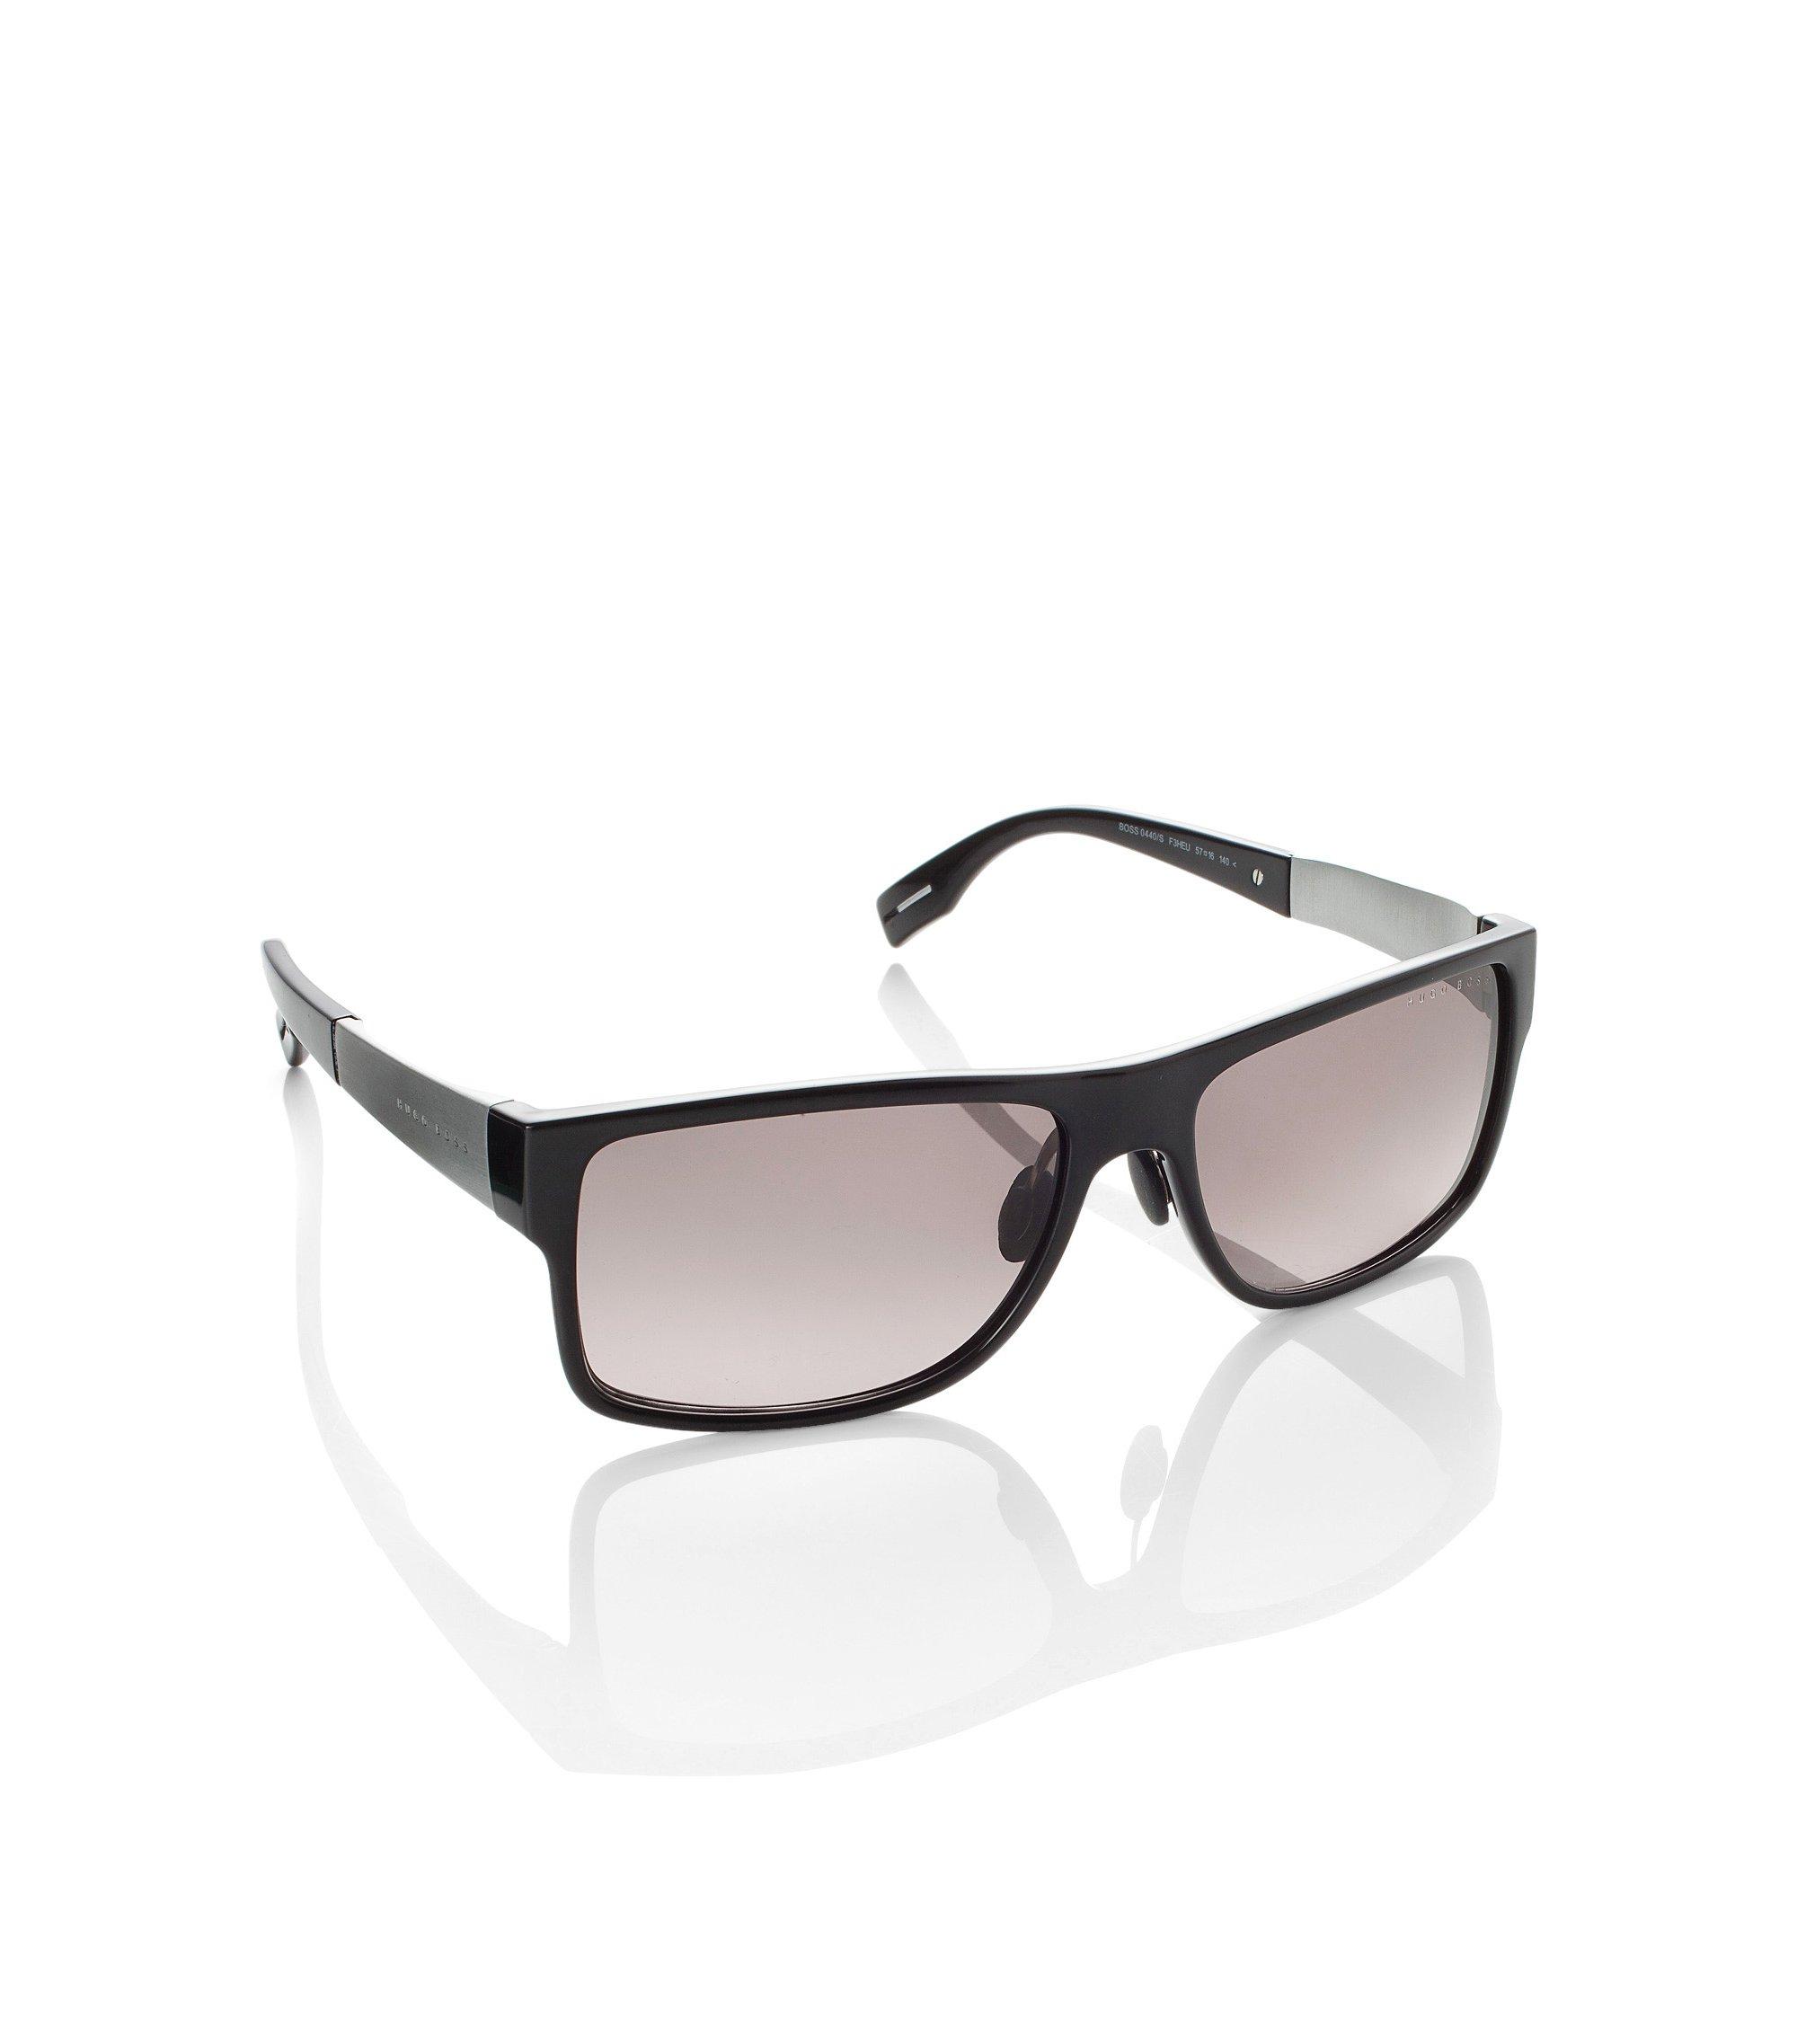 Wayfarer-style sunglasses 'BOSS 0440/S', Assorted-Pre-Pack